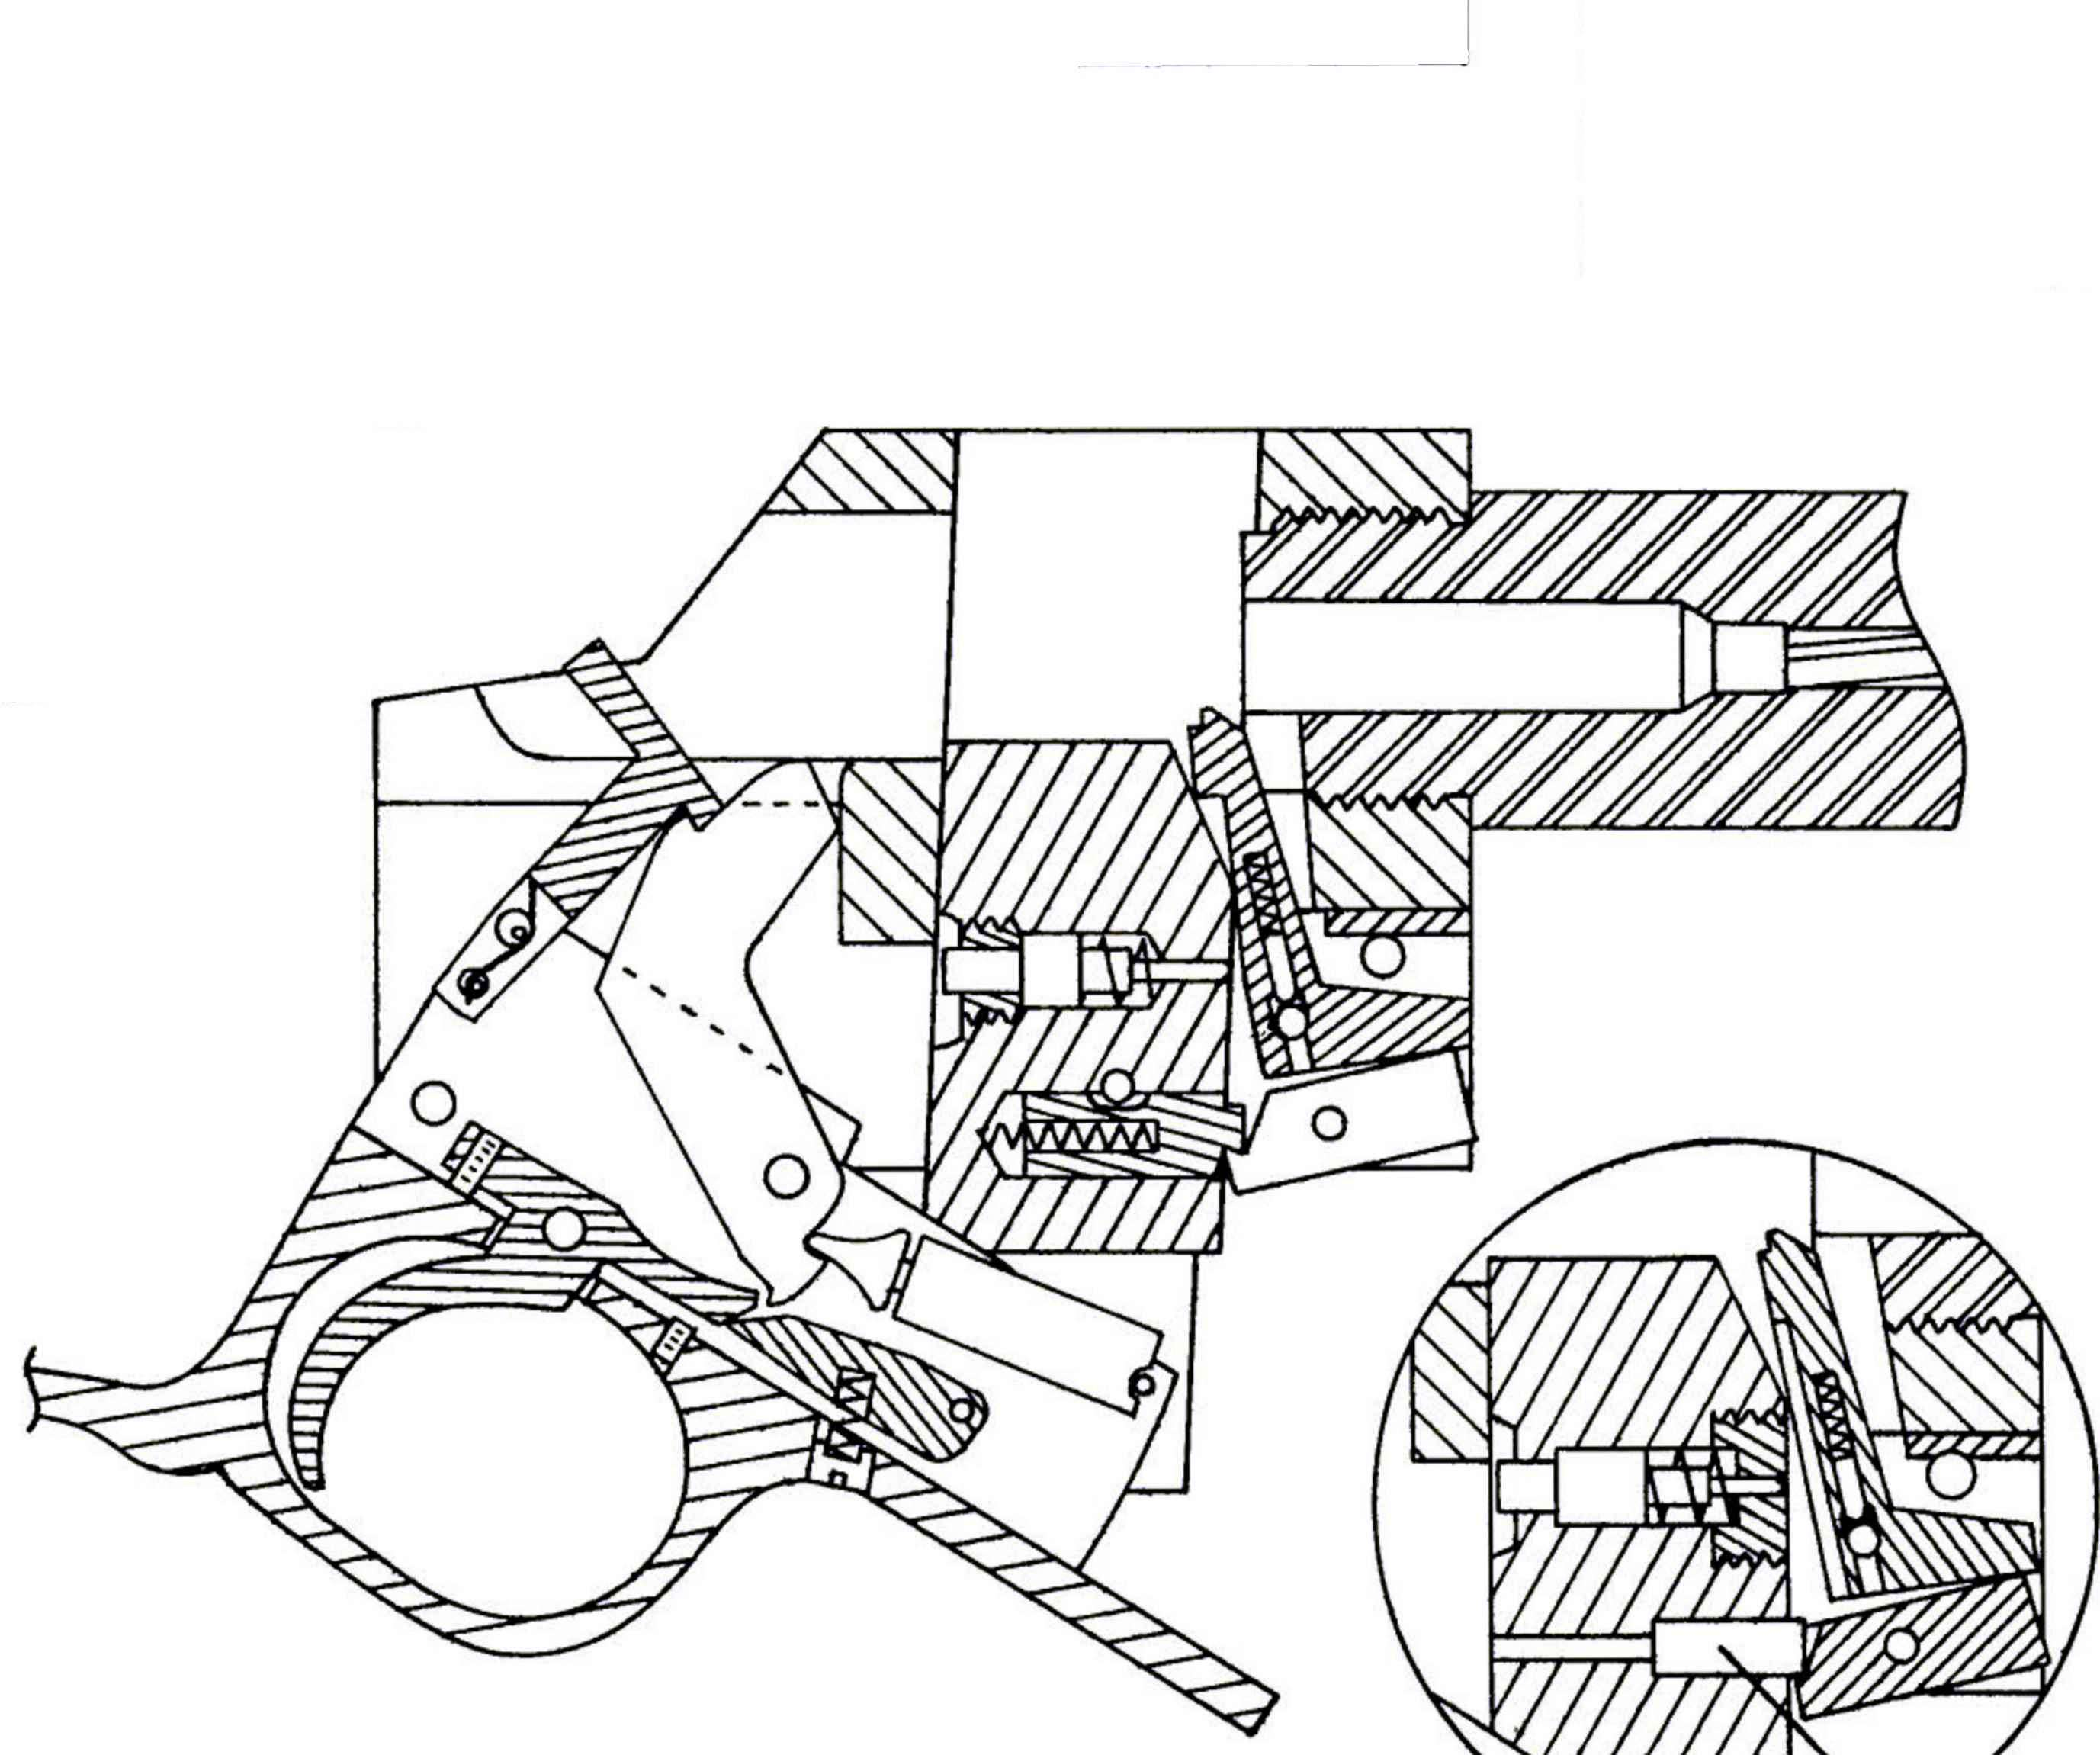 Falling Block Rifle Plans Rifle Plans Bev Fitchett S